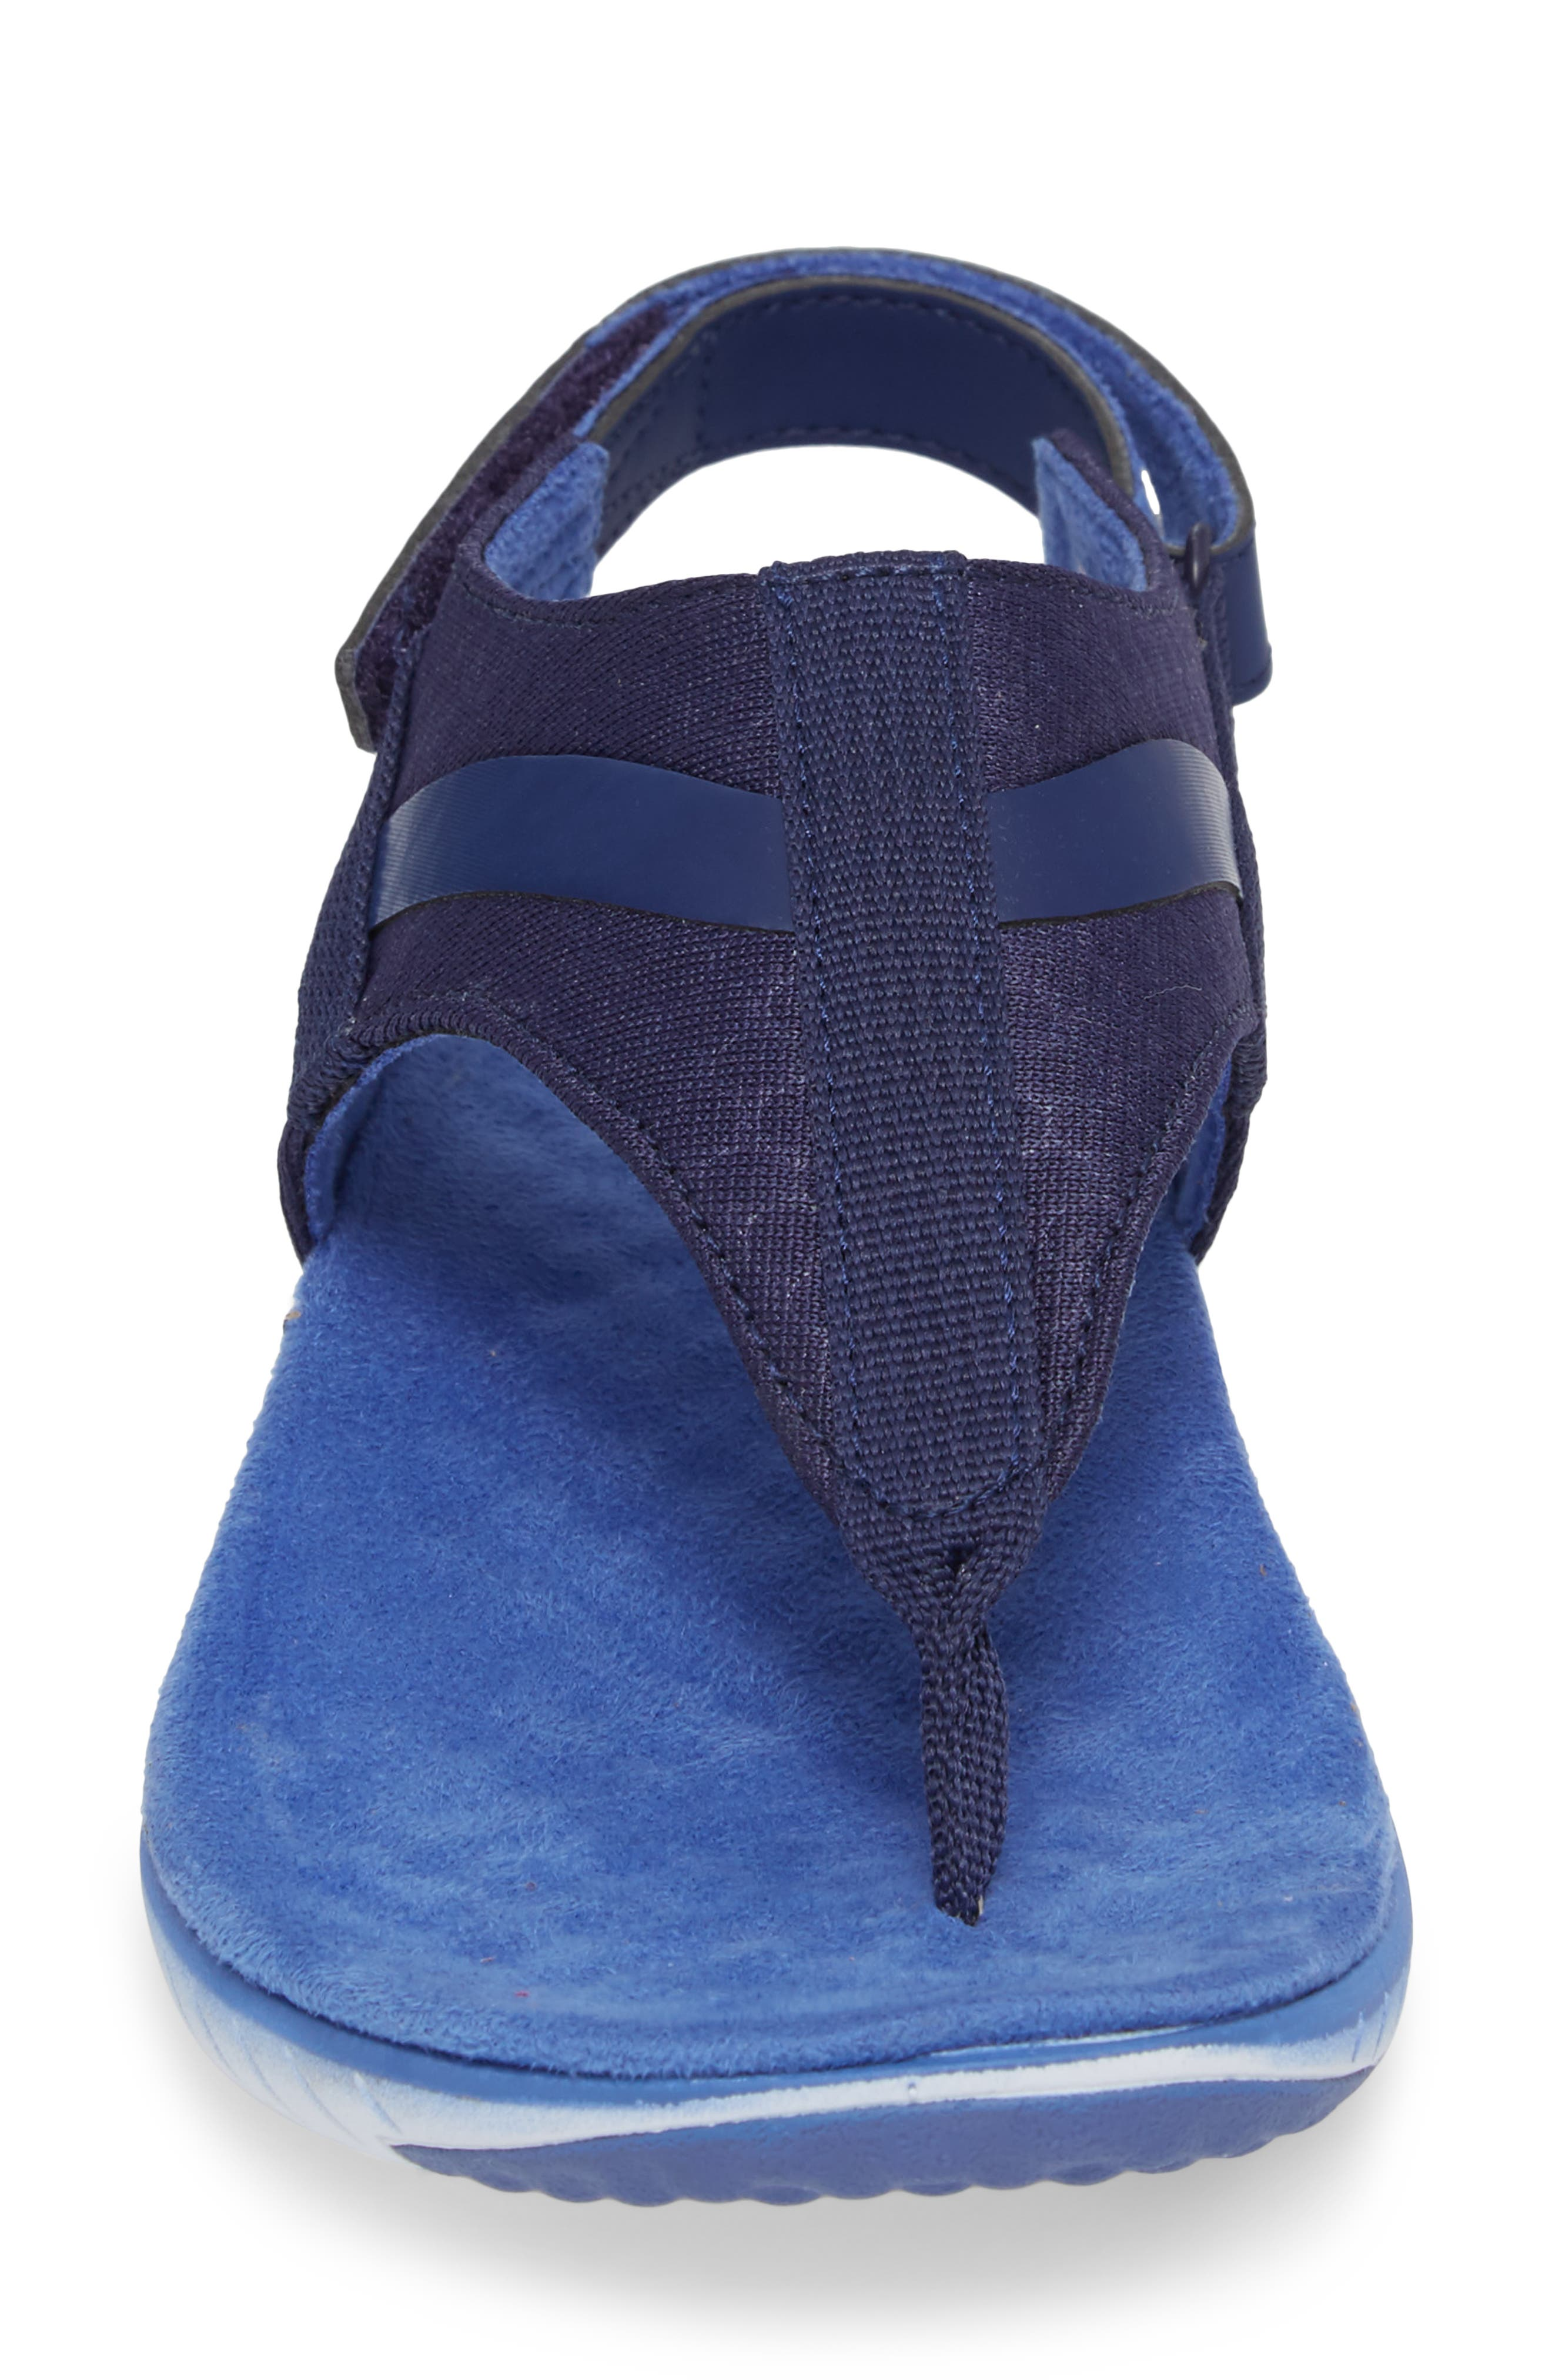 1SIX8 Linna Slide Air Cushion+ Sandal,                             Alternate thumbnail 15, color,